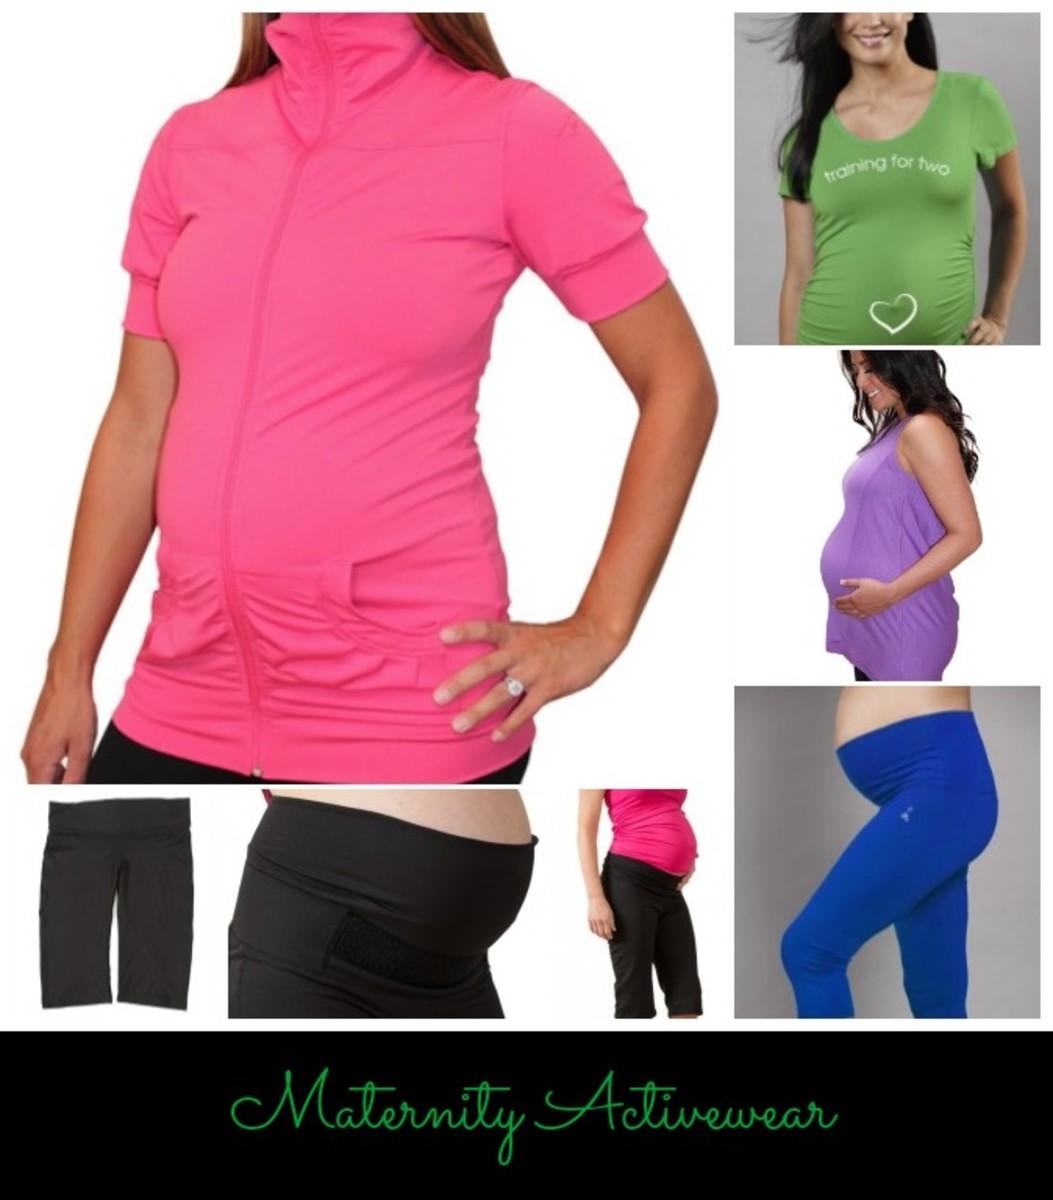 maternityactivewear